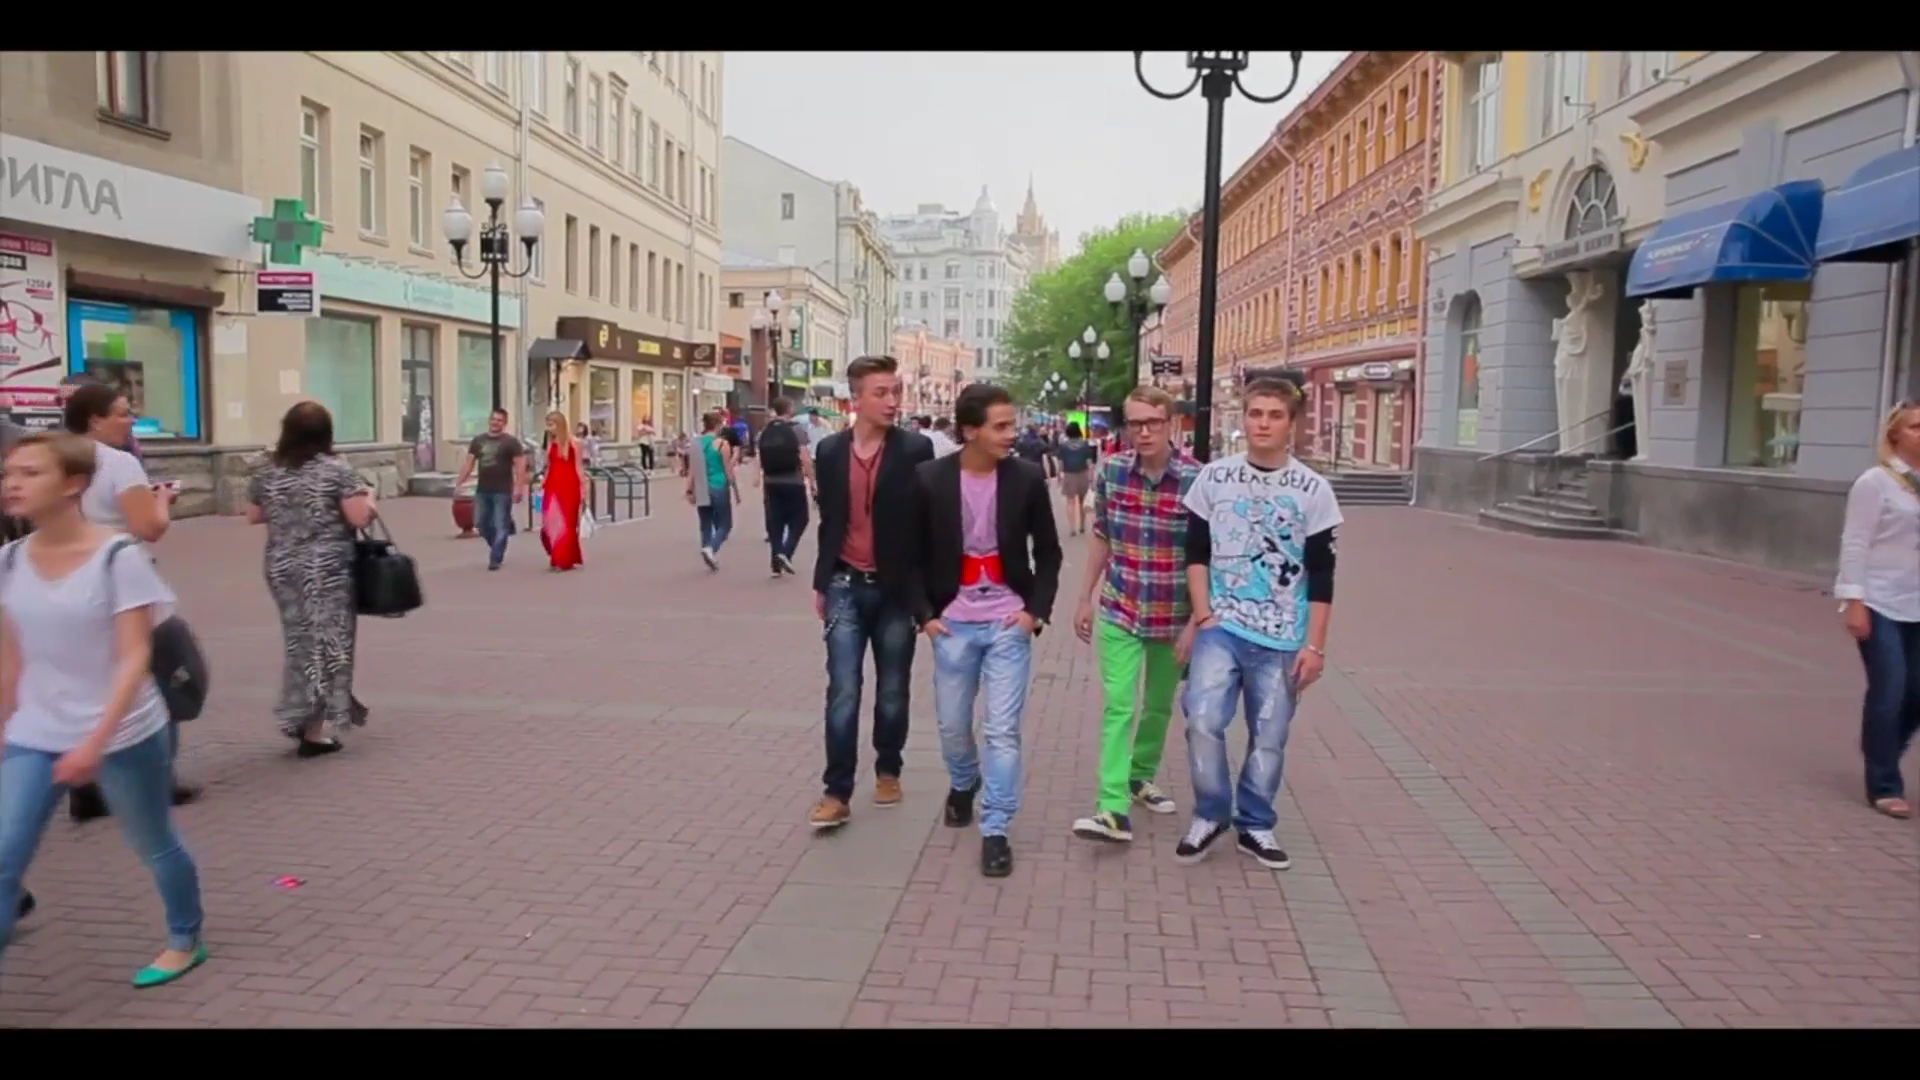 http://i3.imageban.ru/out/2013/09/08/1ecfe745e30f591f2d3787fa108df966.png